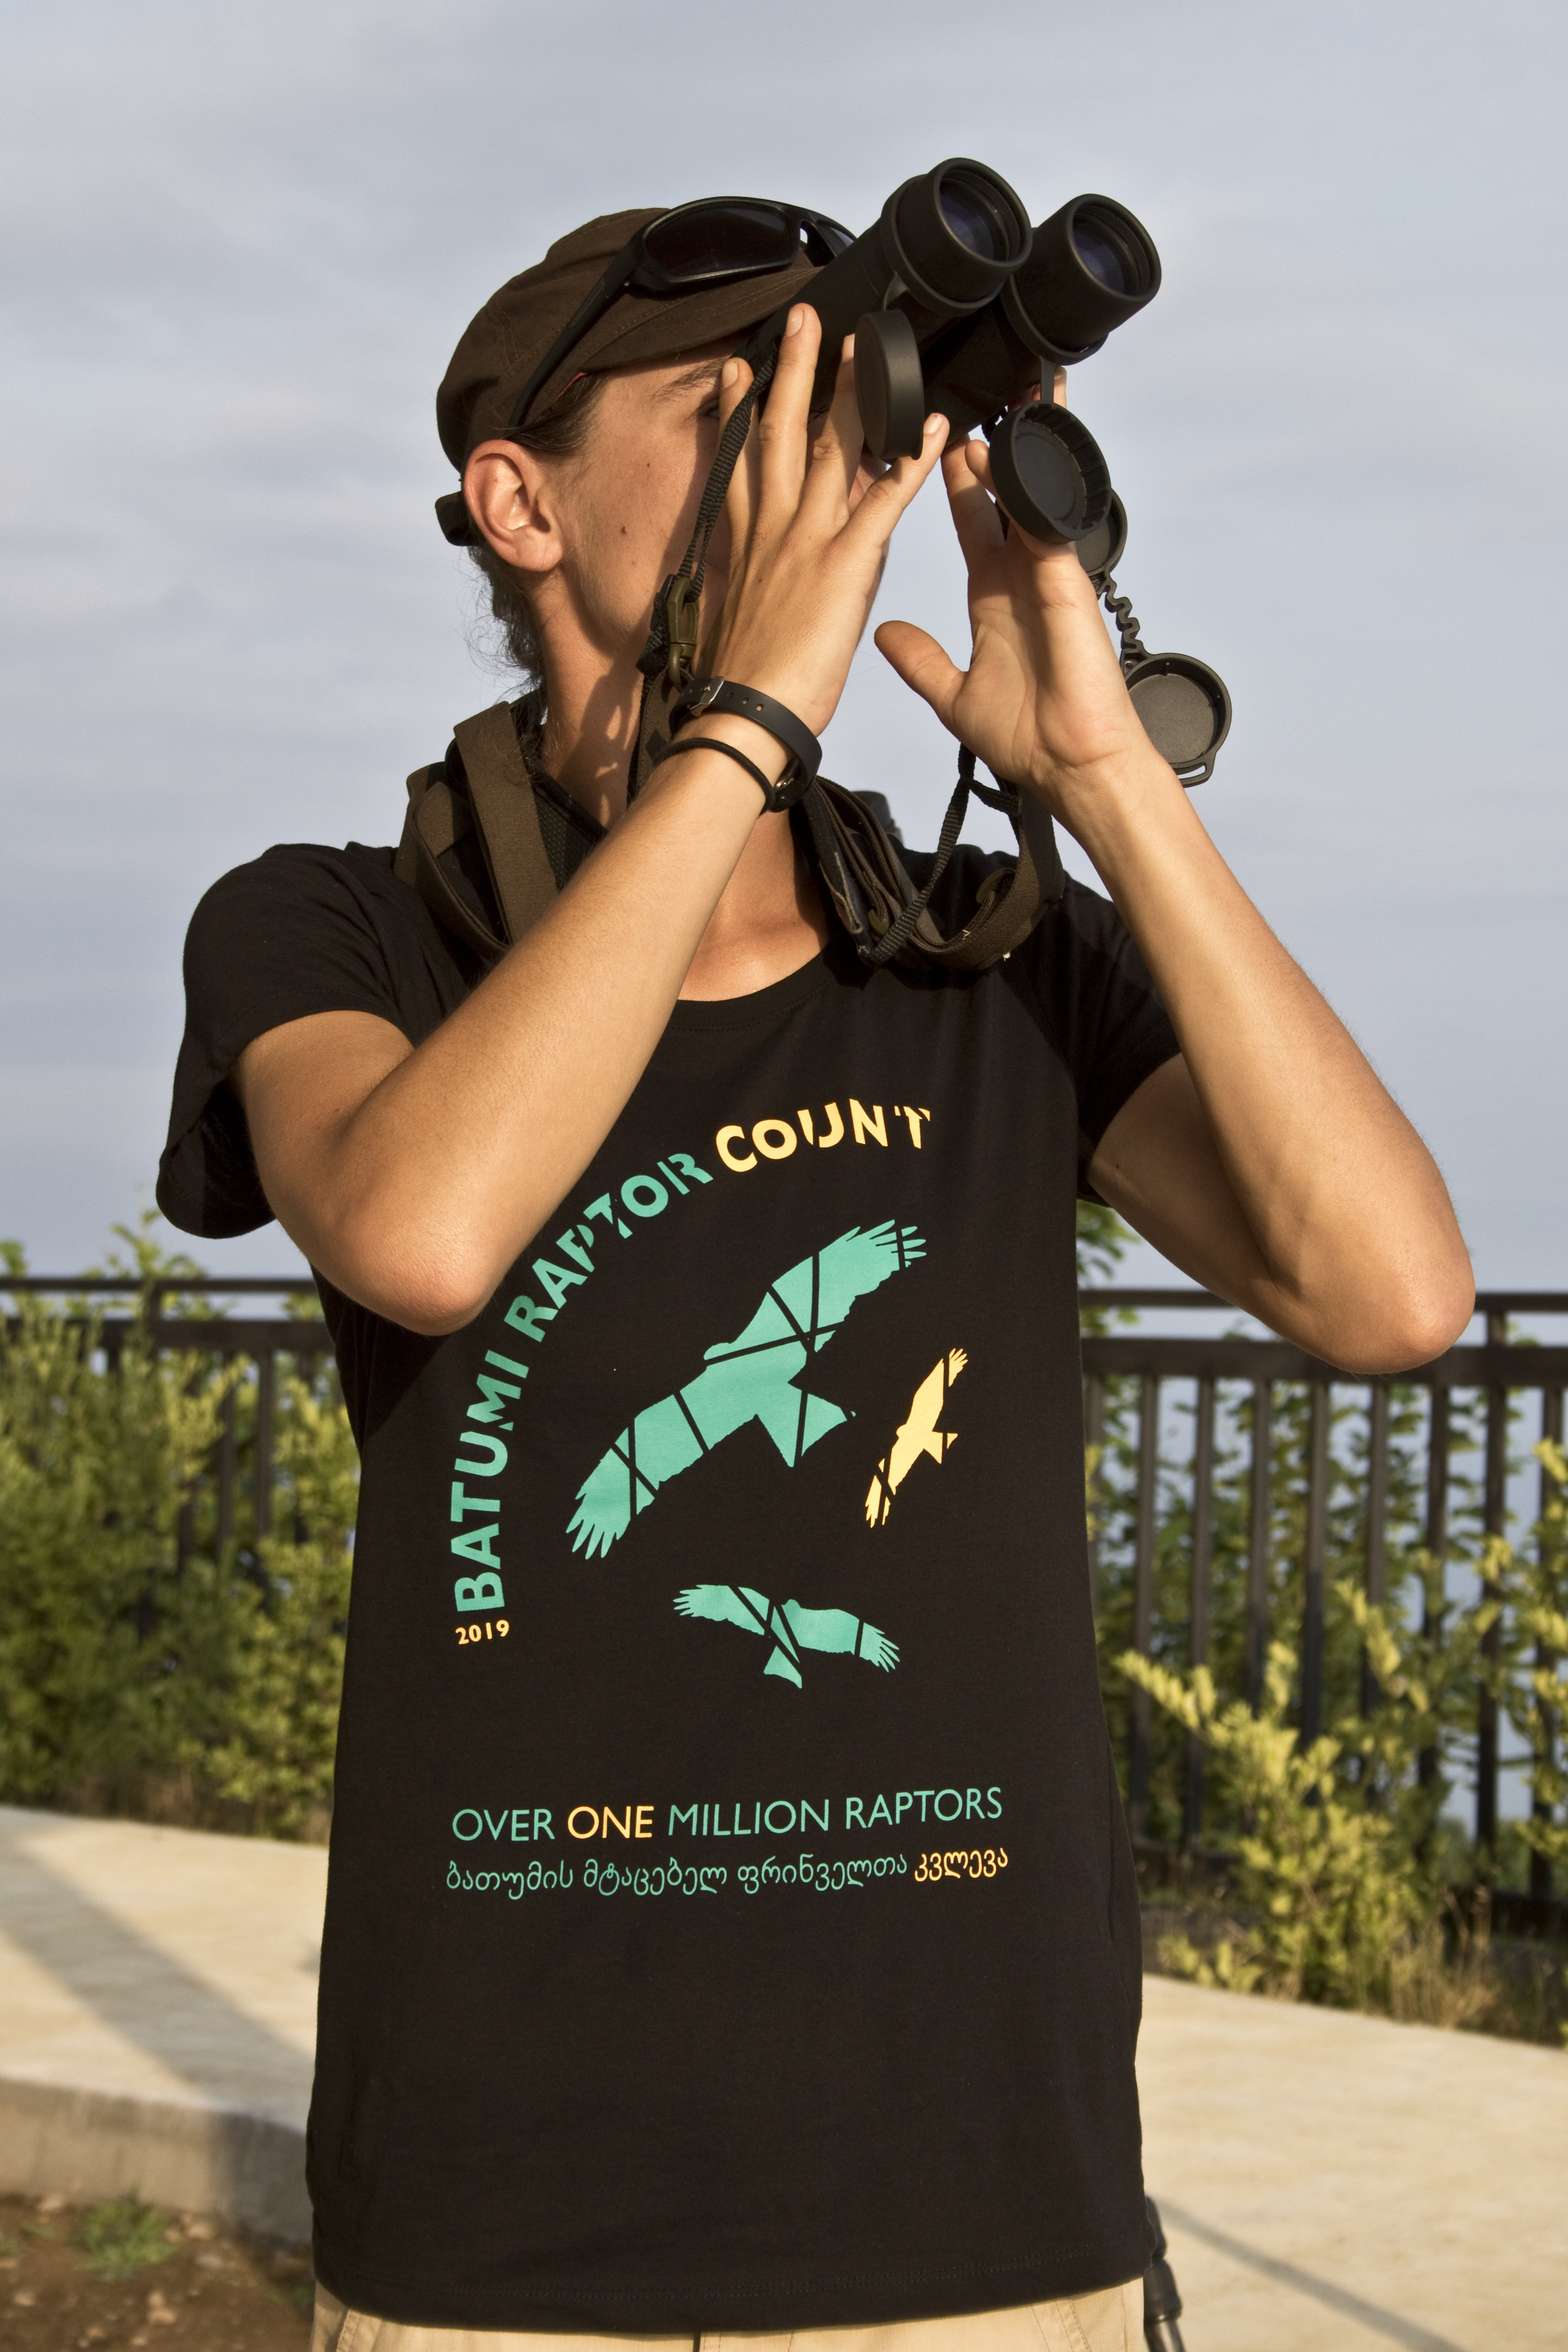 The black 2019 count T-shirt. Photo by Triin Kaasiku.